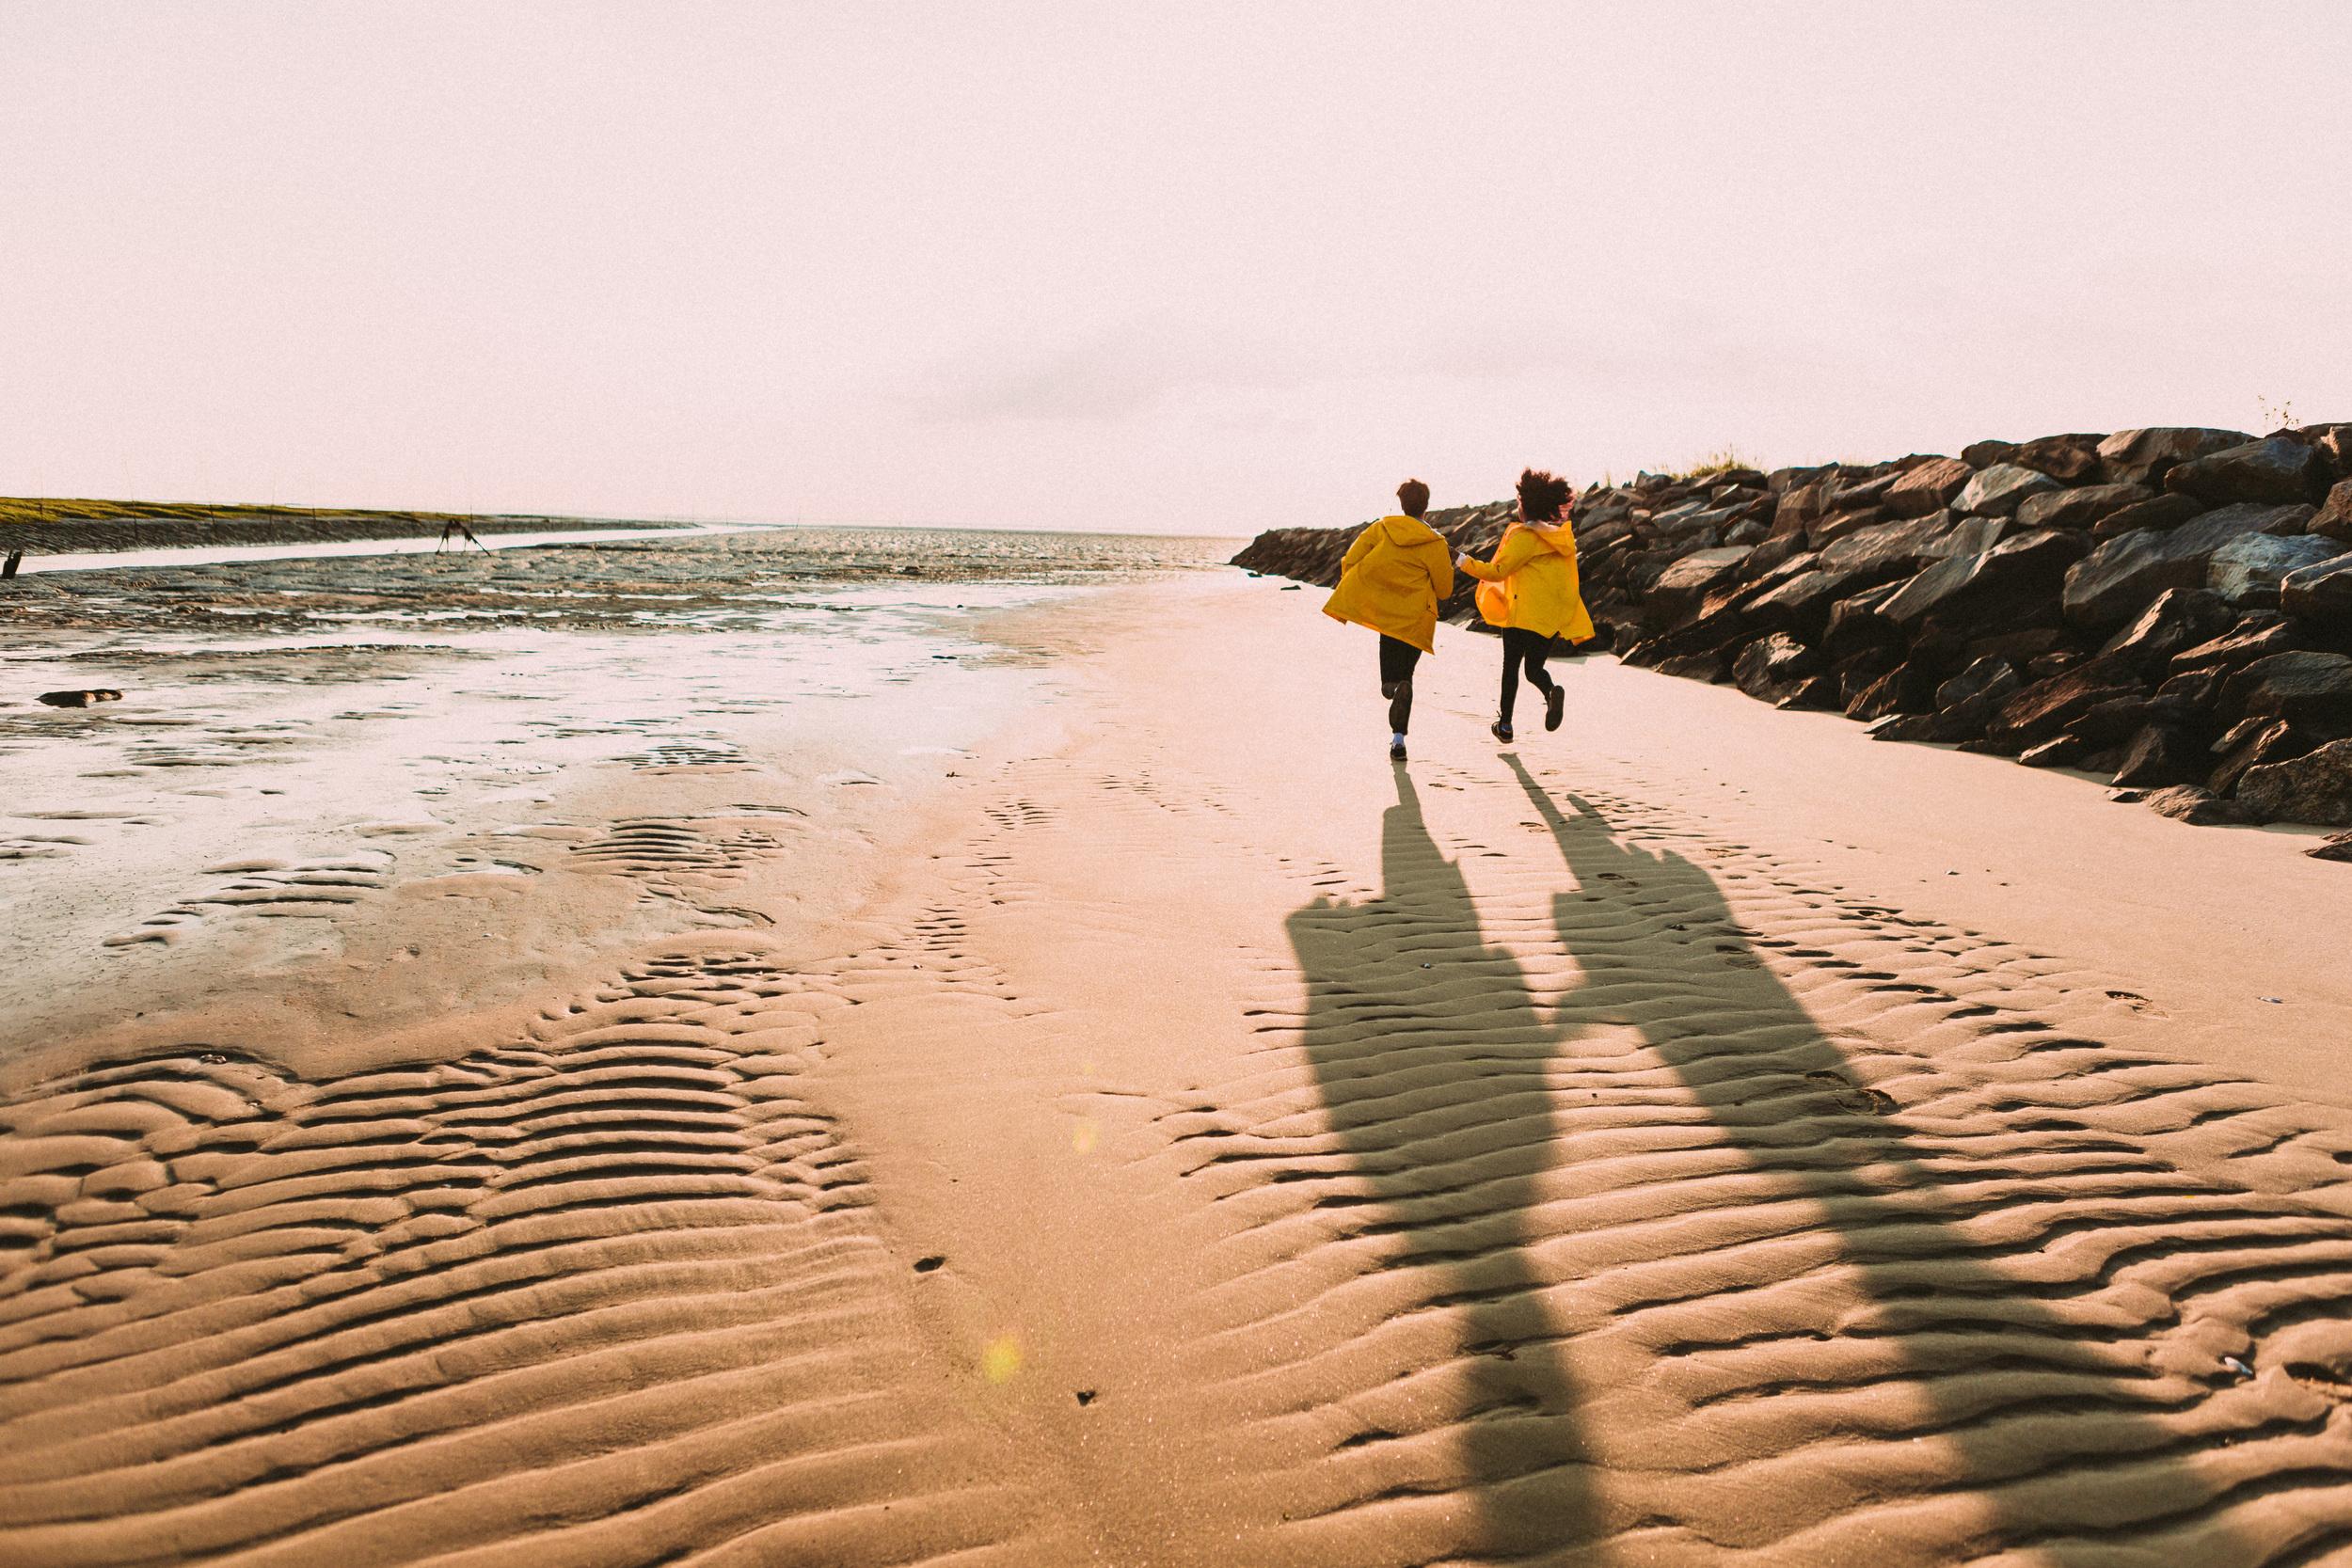 Photographer in Paris, Lovestory, sunset, beach, iheartparisfr